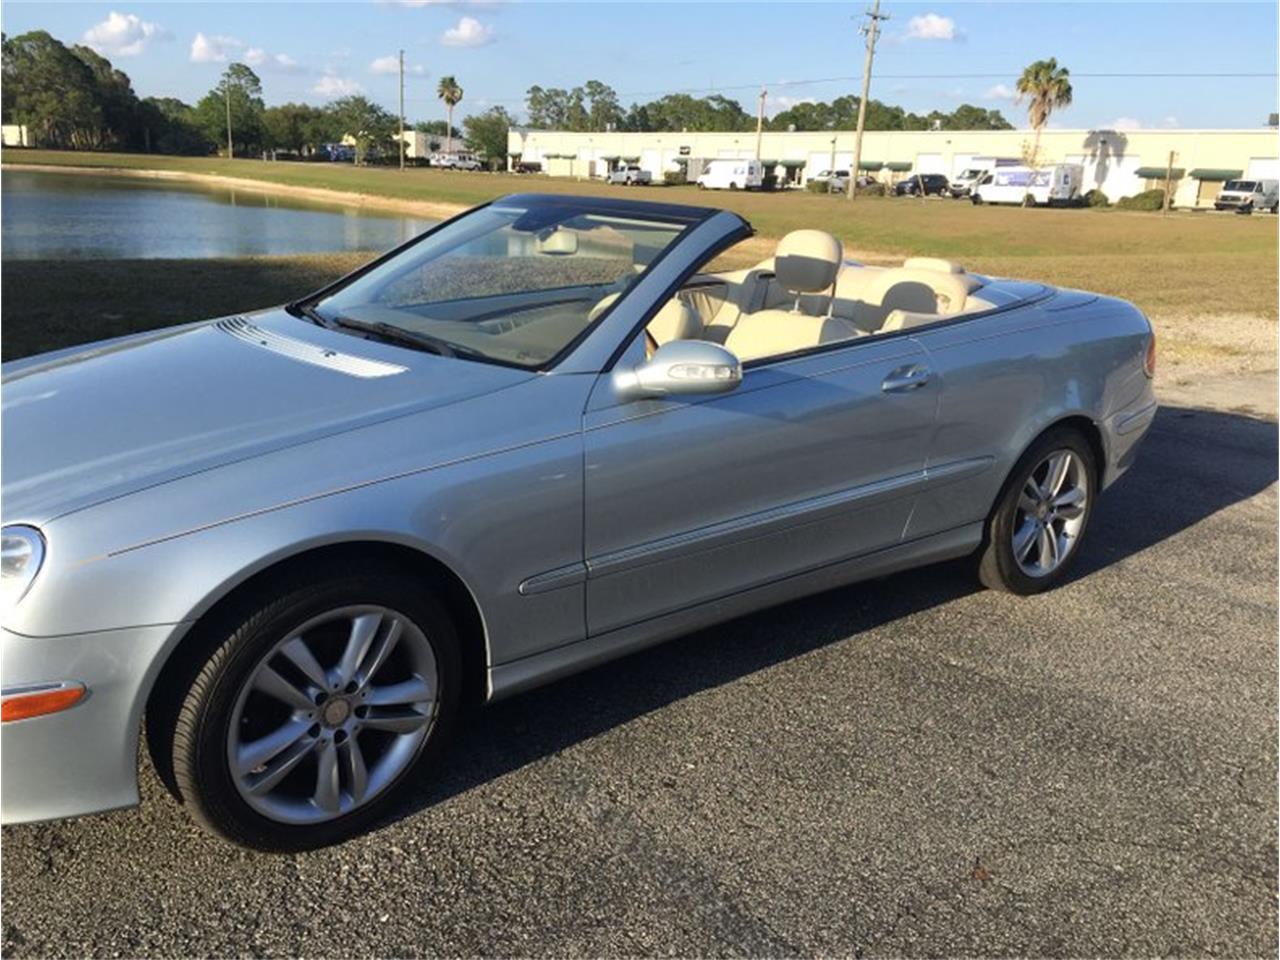 2008 Mercedes-Benz CLK (CC-1420781) for sale in Punta Gorda, Florida